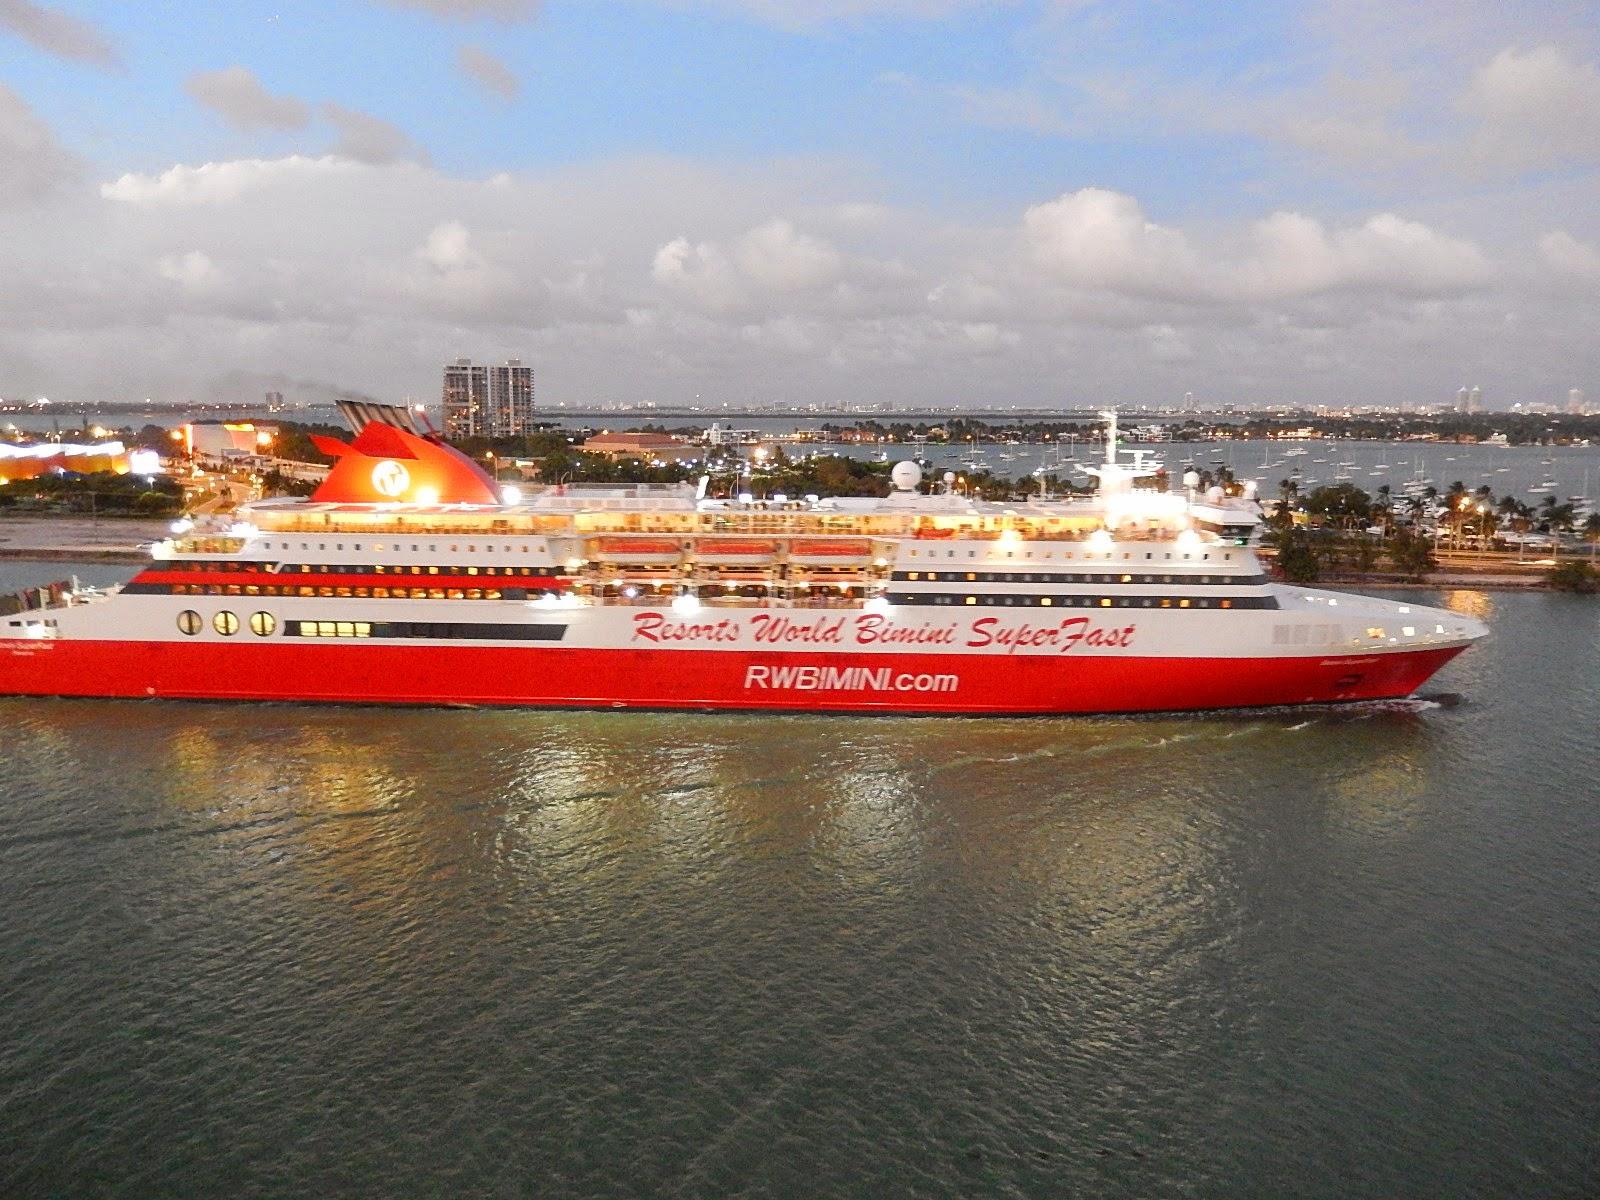 Save Pleasure Island Club Report Club Bimini Superfast - Bimini superfast cruise ship